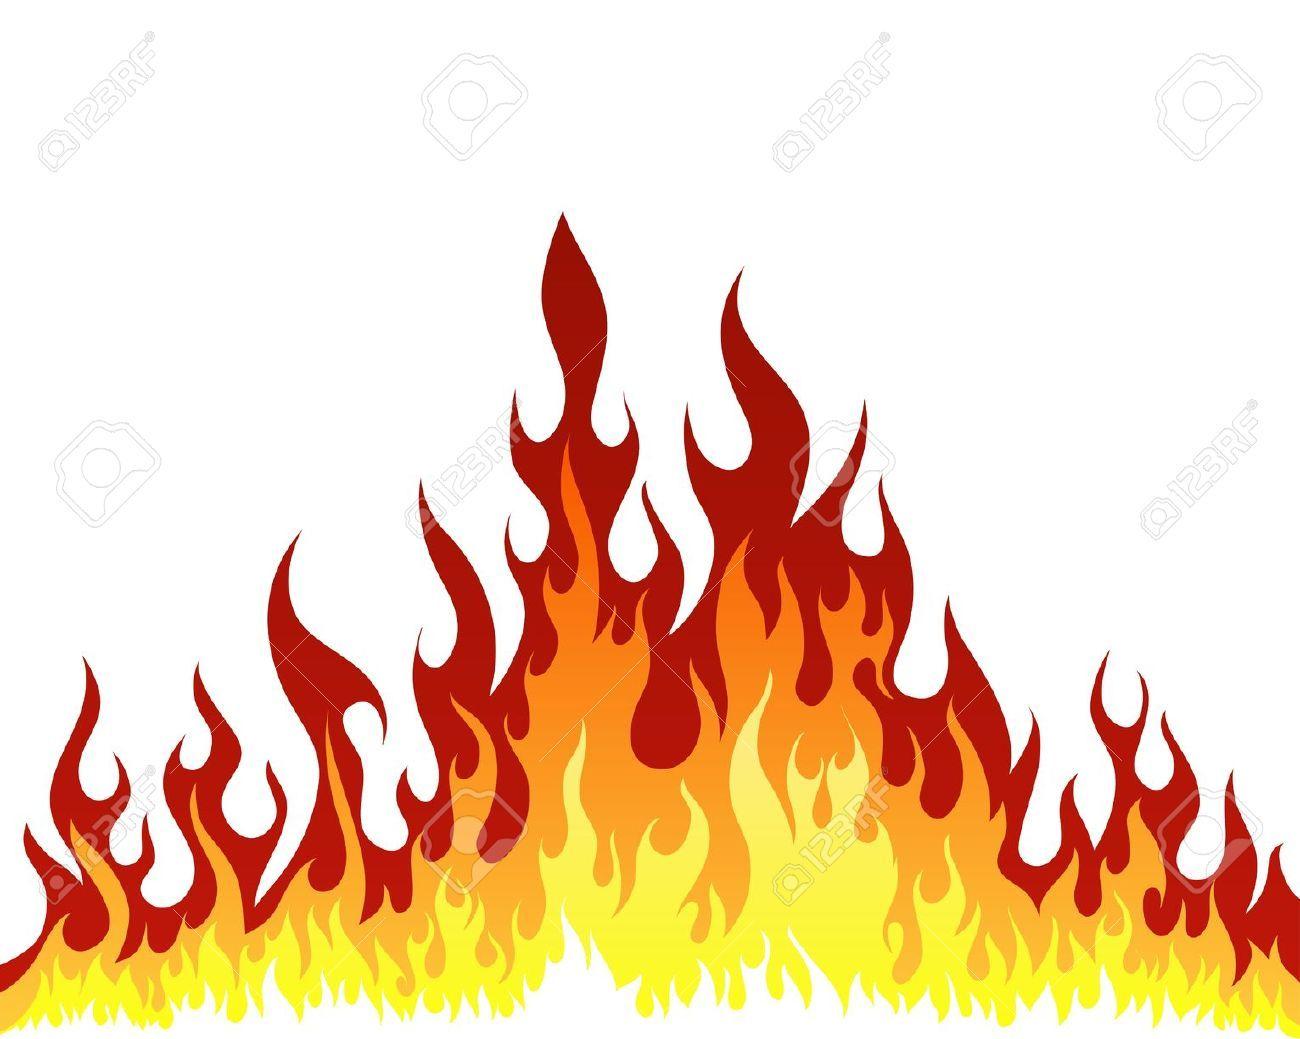 1300x1039 Fire Flames Designs Ltbgtfire Flame Designsltgt Ltbgtdesignlt